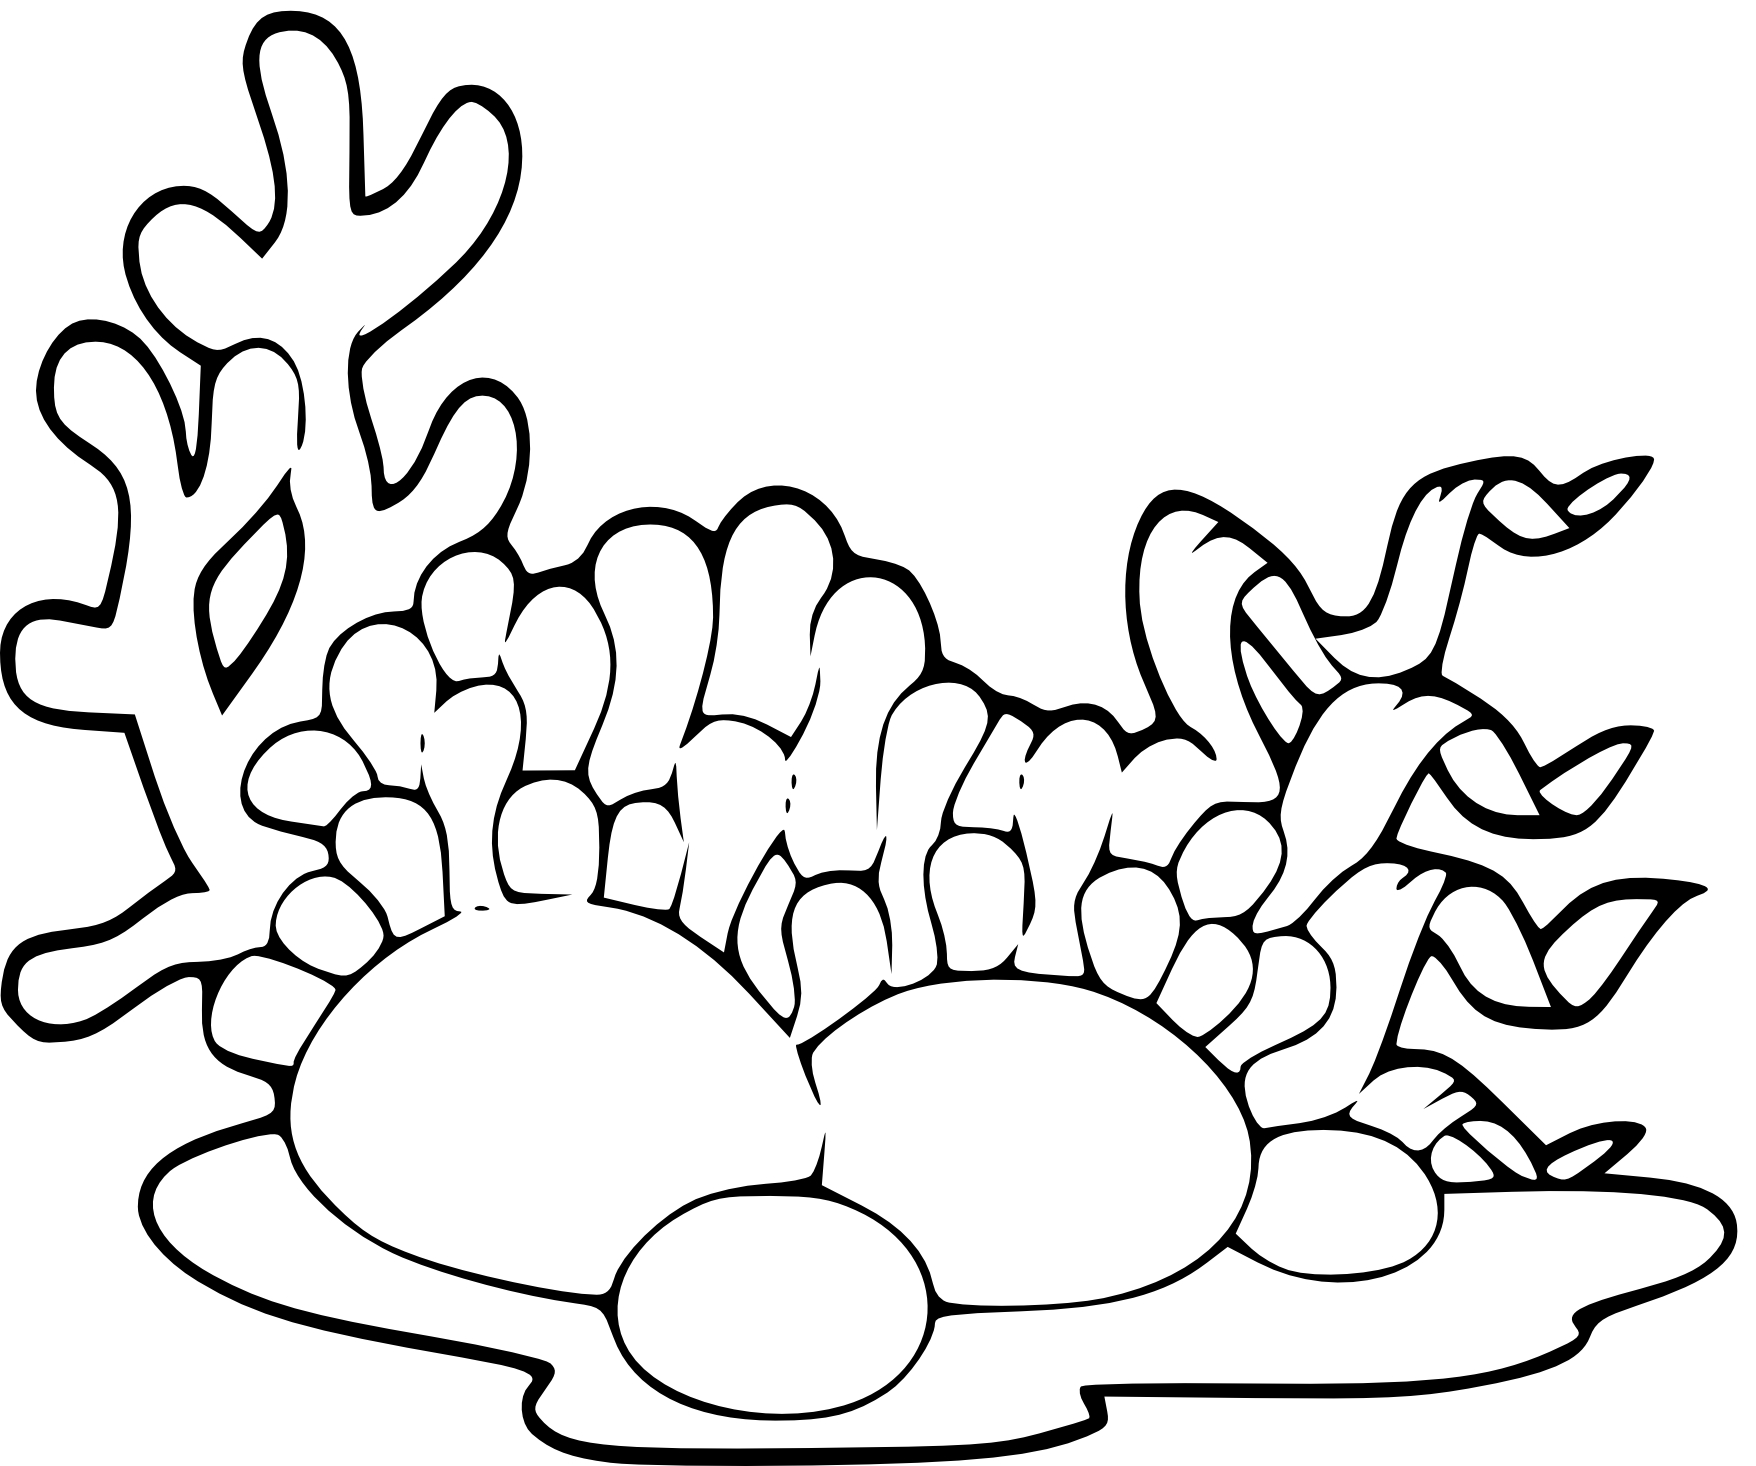 Coloriage algues marines imprimer - Cenefas para dibujar ...